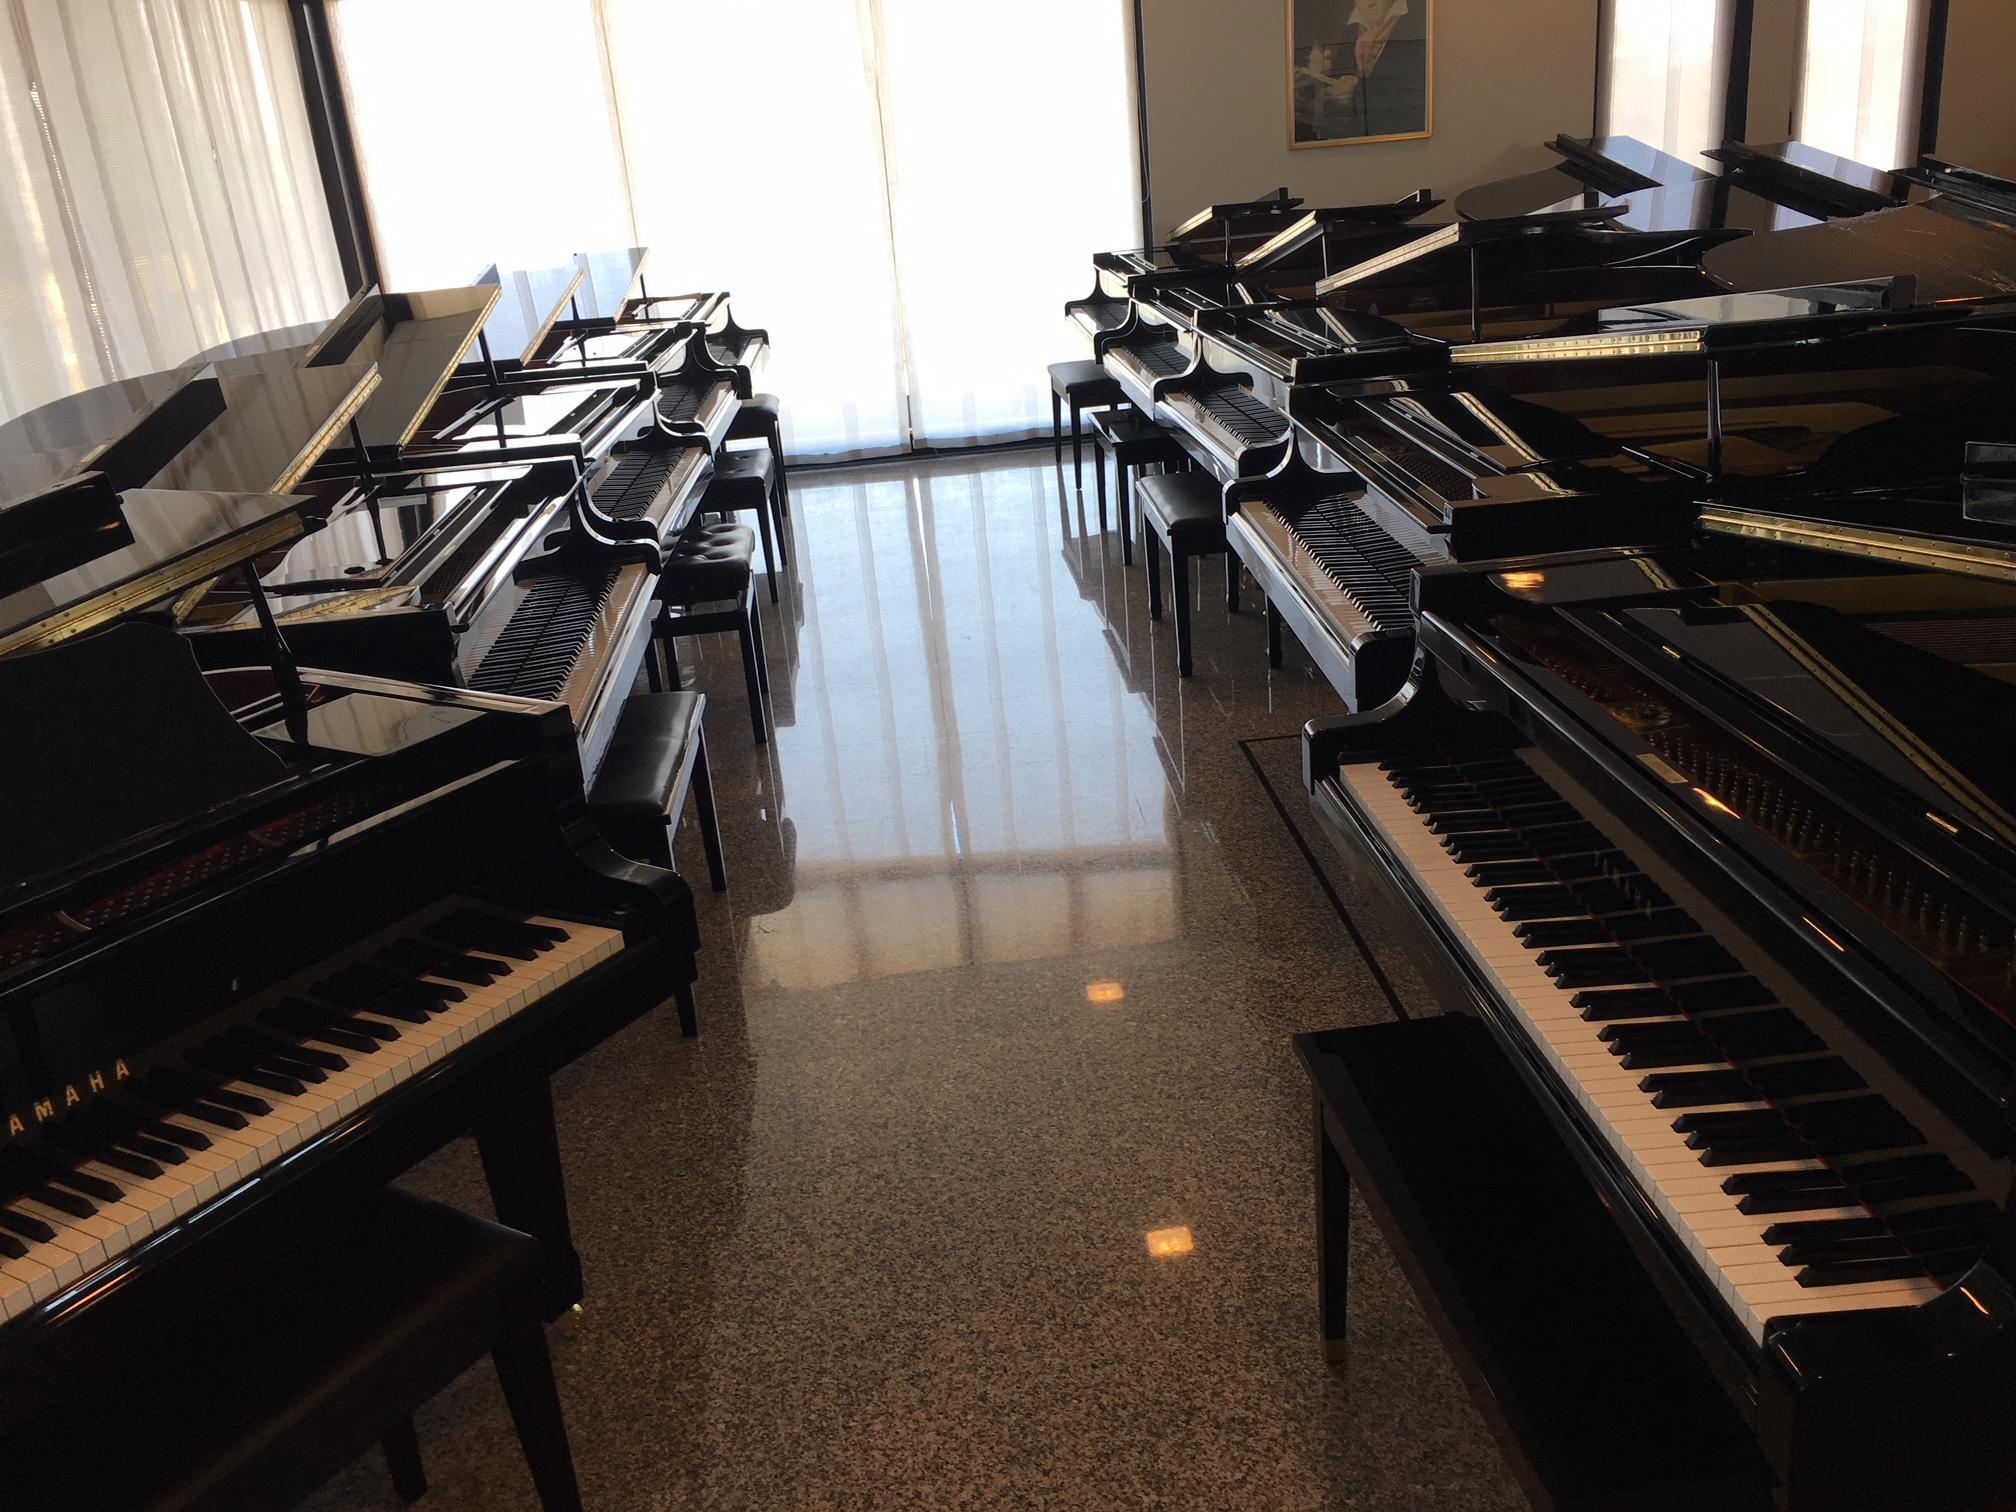 "PIANOFORTE YAMAHA U3 SILENT- PIANOFORTE VERTICALE YAMAHA U3 CON SILENT- PIANOFORTI SILENT DA ""LONGATO PIANOFORTI""- PIANOFORTE YAMAHA U3 SILENT A ROMA- YAMAHA U3 SILENT A MILANO- YAMAHA U3 SILENT A LECCE- PIANOFORTI YAMAHA U3 SILENT IN SICILIA- PIANOFORTE YAMAHA U3 SILENT A ROMA- PIANOFORTI YAMAHA U3 SILENT A GENOVA- PIANOFORTI YAMAHA U3 SILENT A PAVIA- YAMHA U1-U3 SILENT DA ""LONGATO PIANOFORTI""- YAMAHA U3 SILENT A MACERATA- YAMHA U3 SILENT A NAPOLI- YAMAHA U3 SILENT A BARI- YAMAHA U3 SILENT A FOGGIA-"